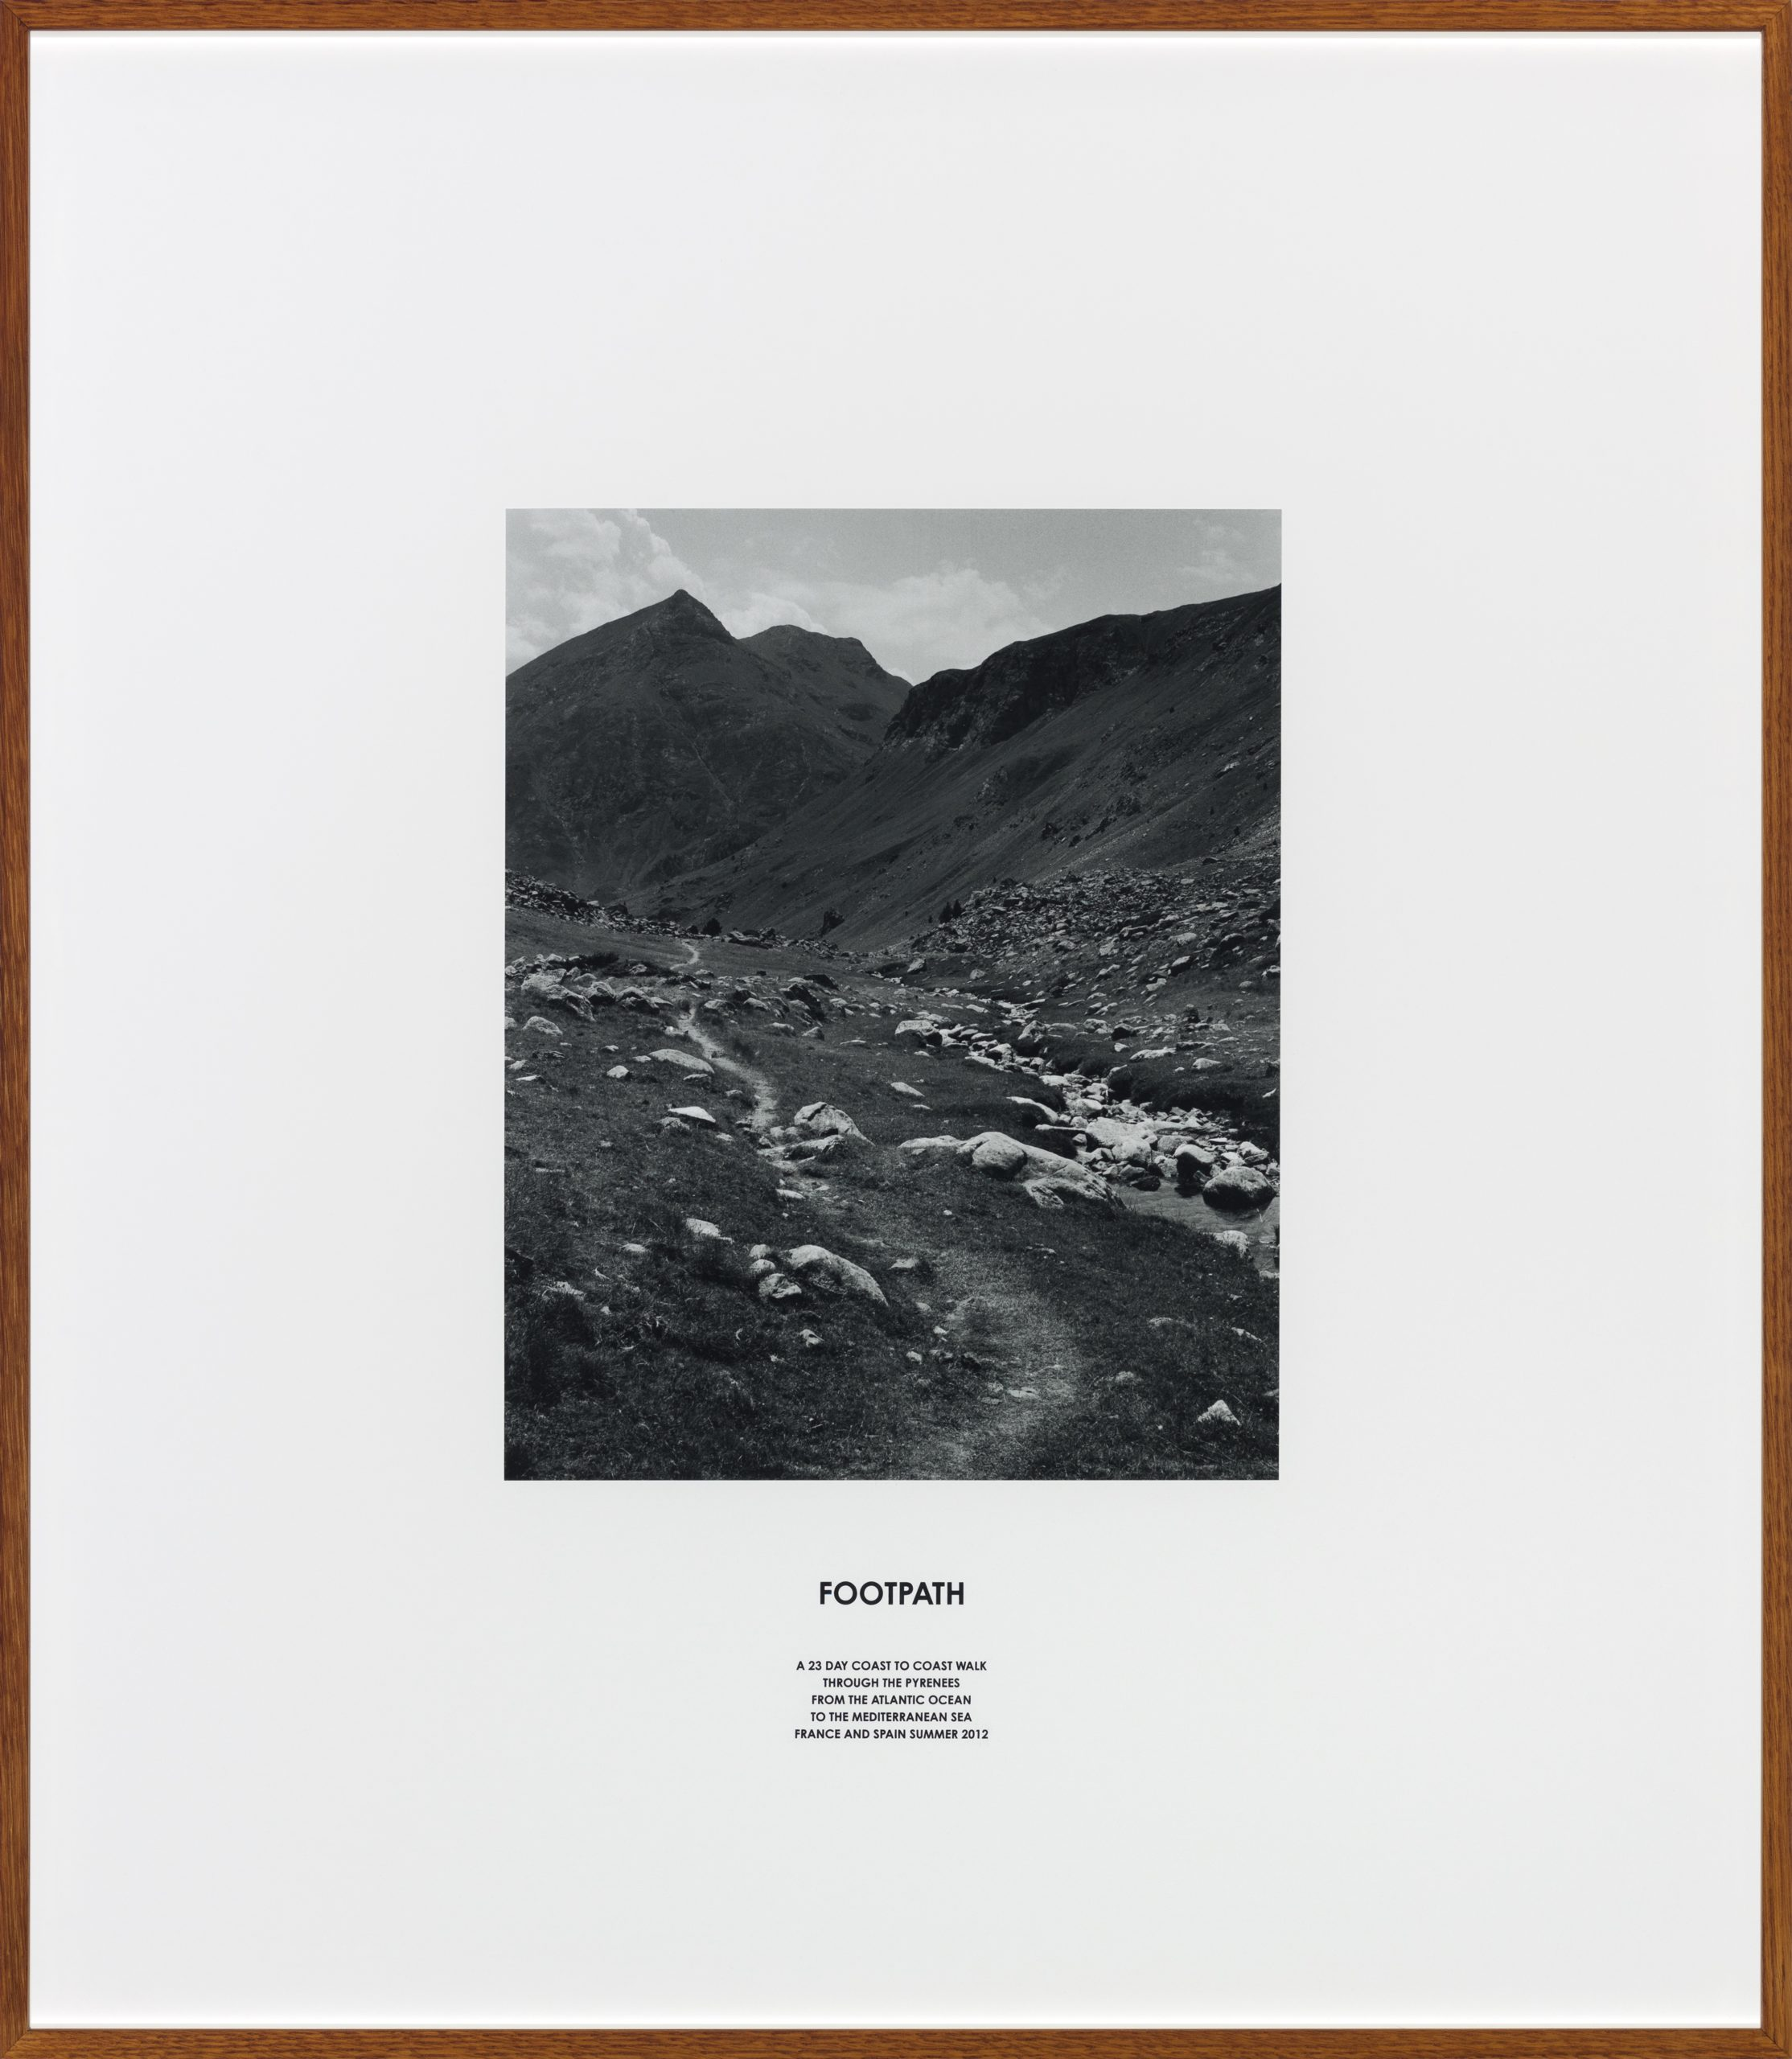 Hamish Fulton, Footpath, 2016. Courtesy Galerie Thomas Schulte.